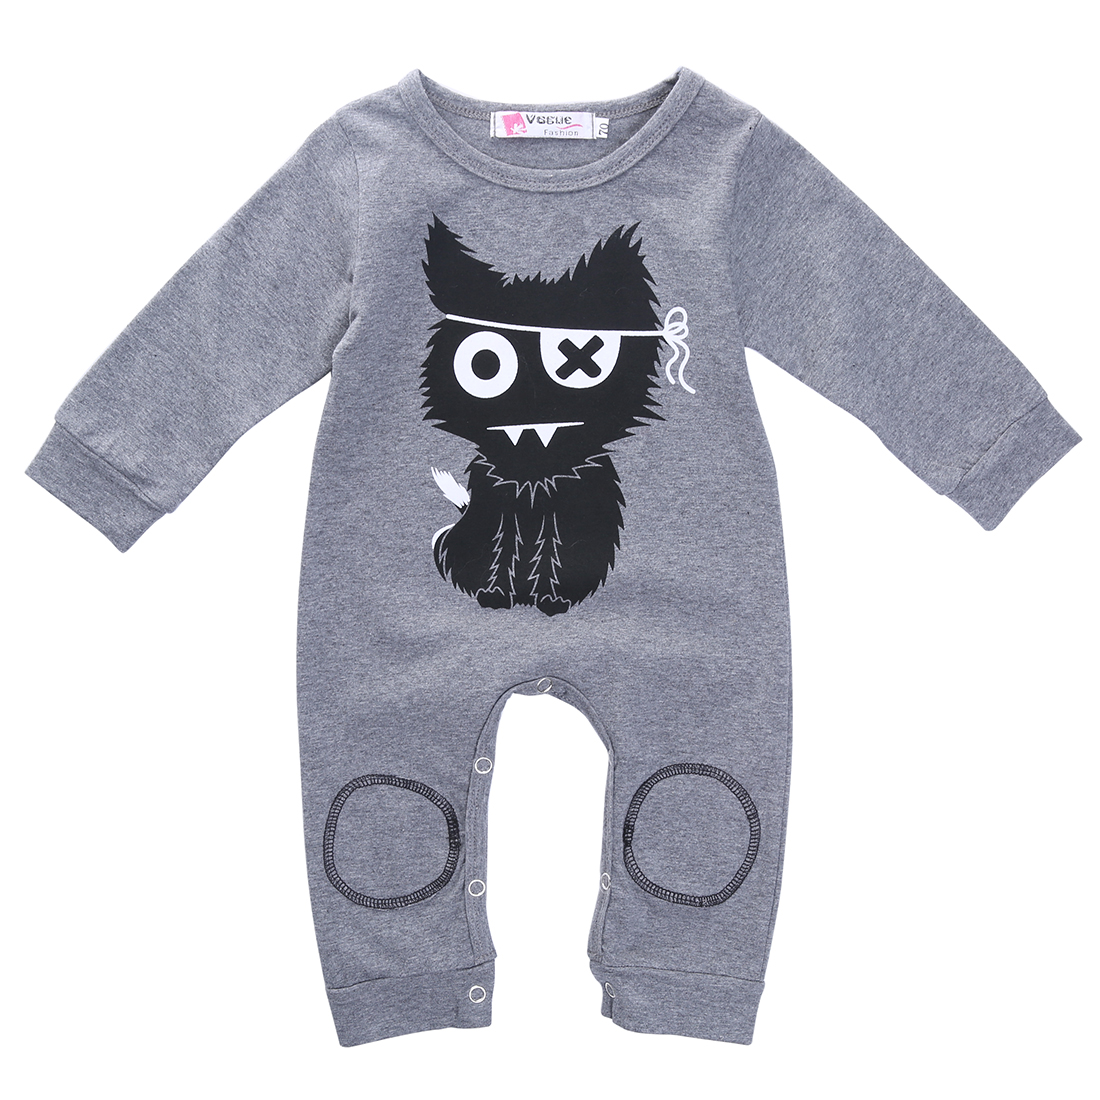 dd0b7e648 Detail Feedback Questions about Baby Boy Girl Autumn Warm Clothing ...